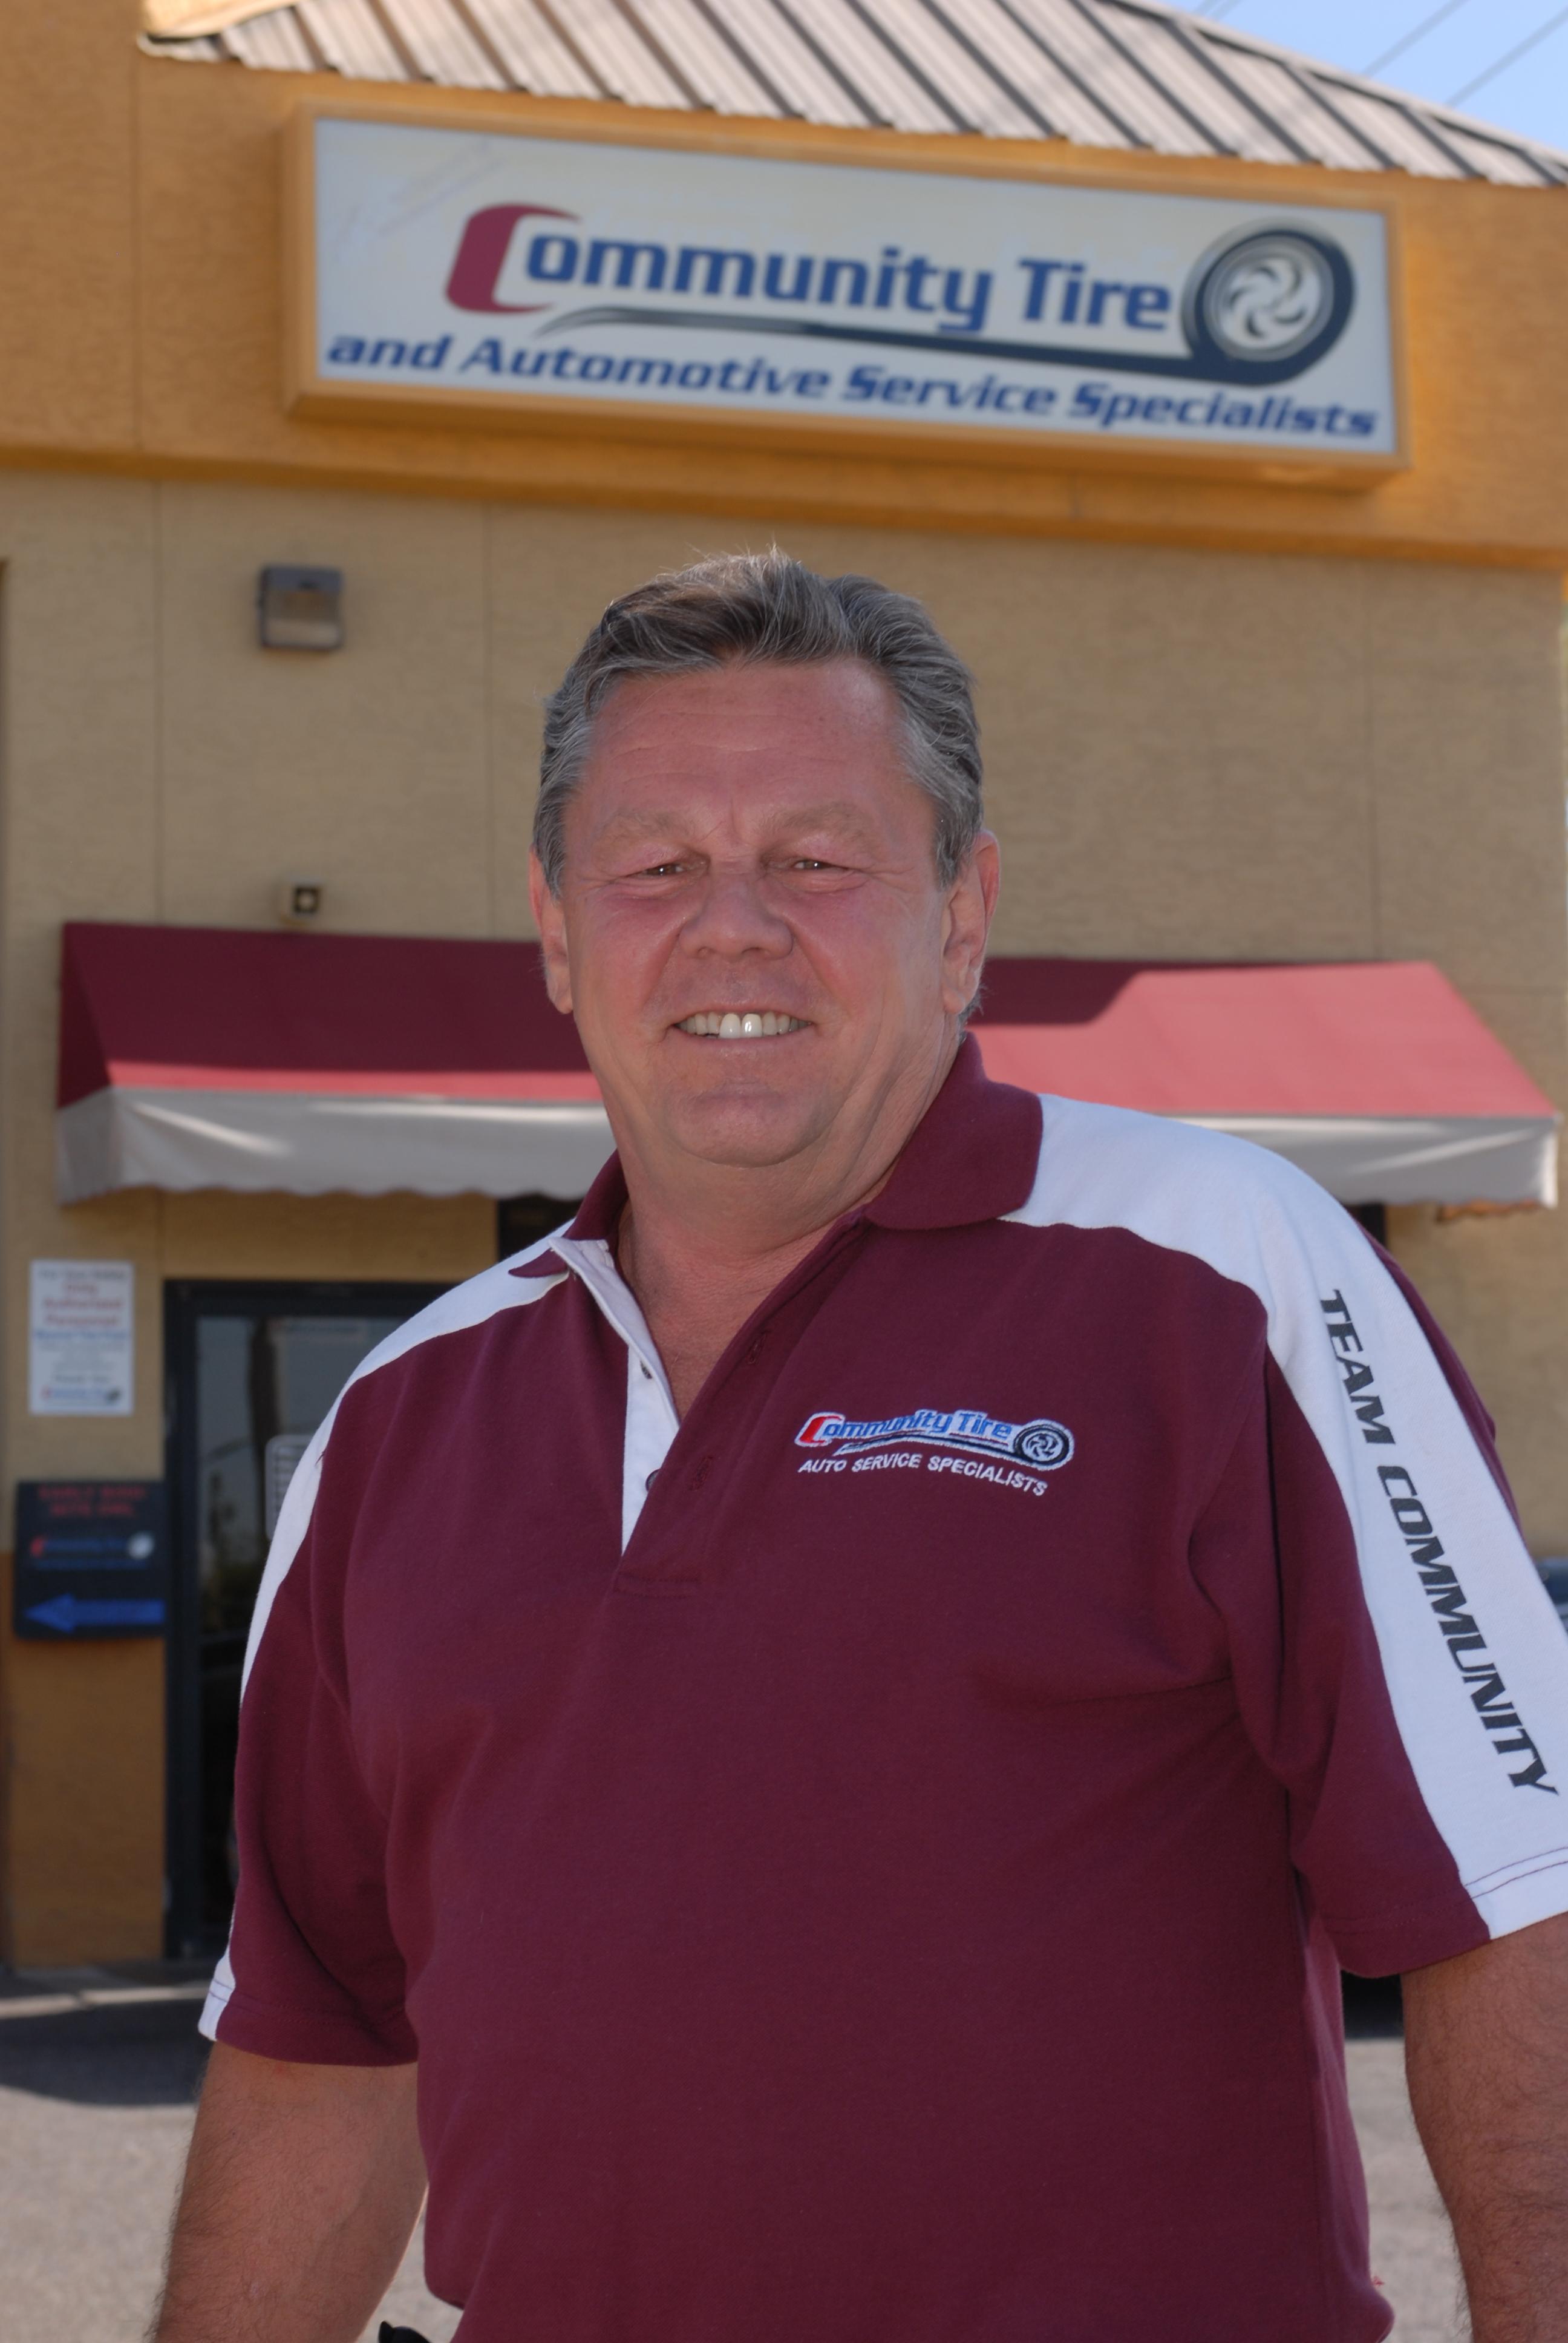 Howard J. Fleischmann Sr., Owner, Community Tire and Automotive Service Specialists.